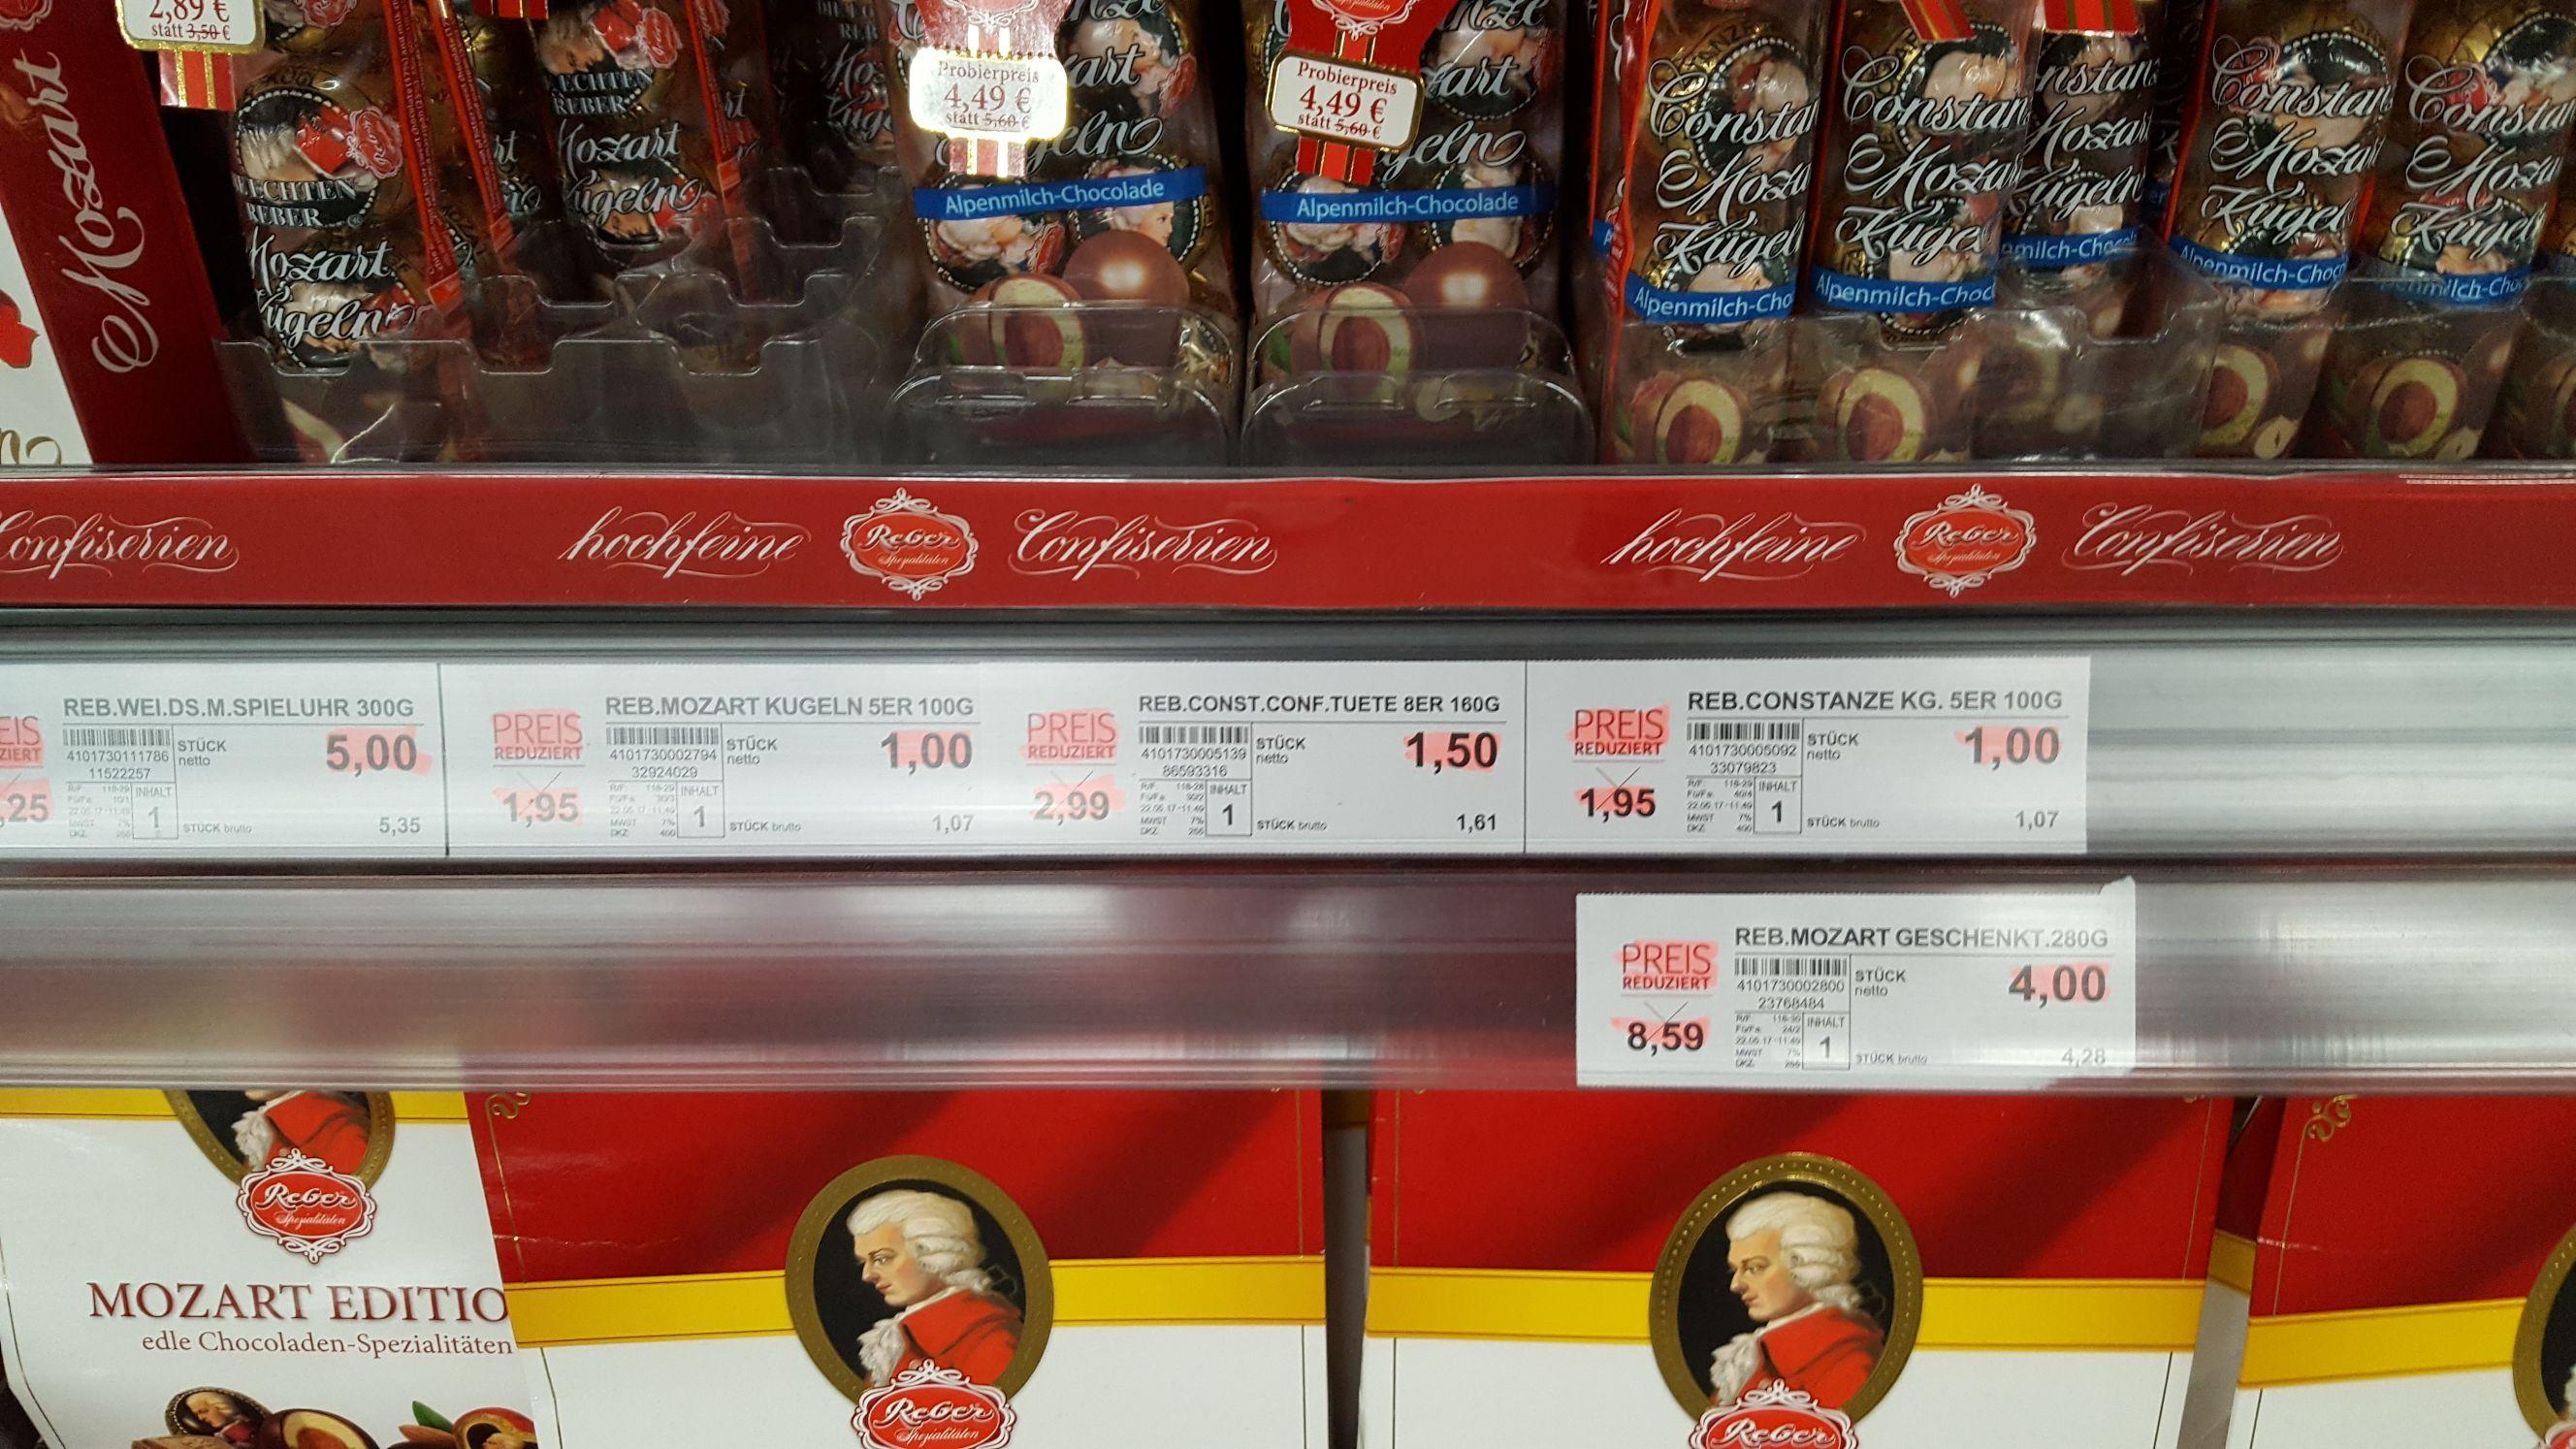 [Lokal - Großhandel] Reber Pralinen Ersparnis ca. 70 %, z.B. Mozartkugeln (SELGROS Ingolstadt)